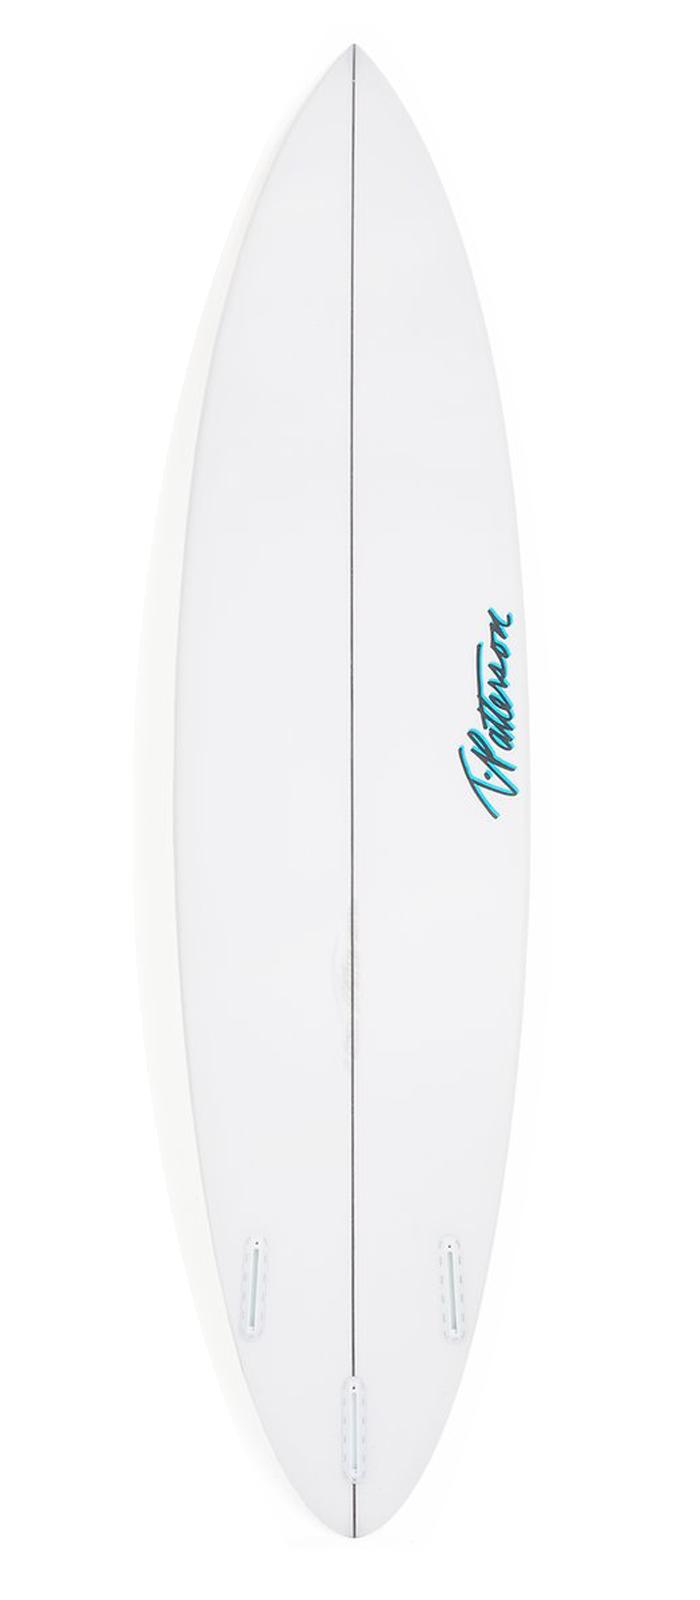 STEP UP surfboard model bottom